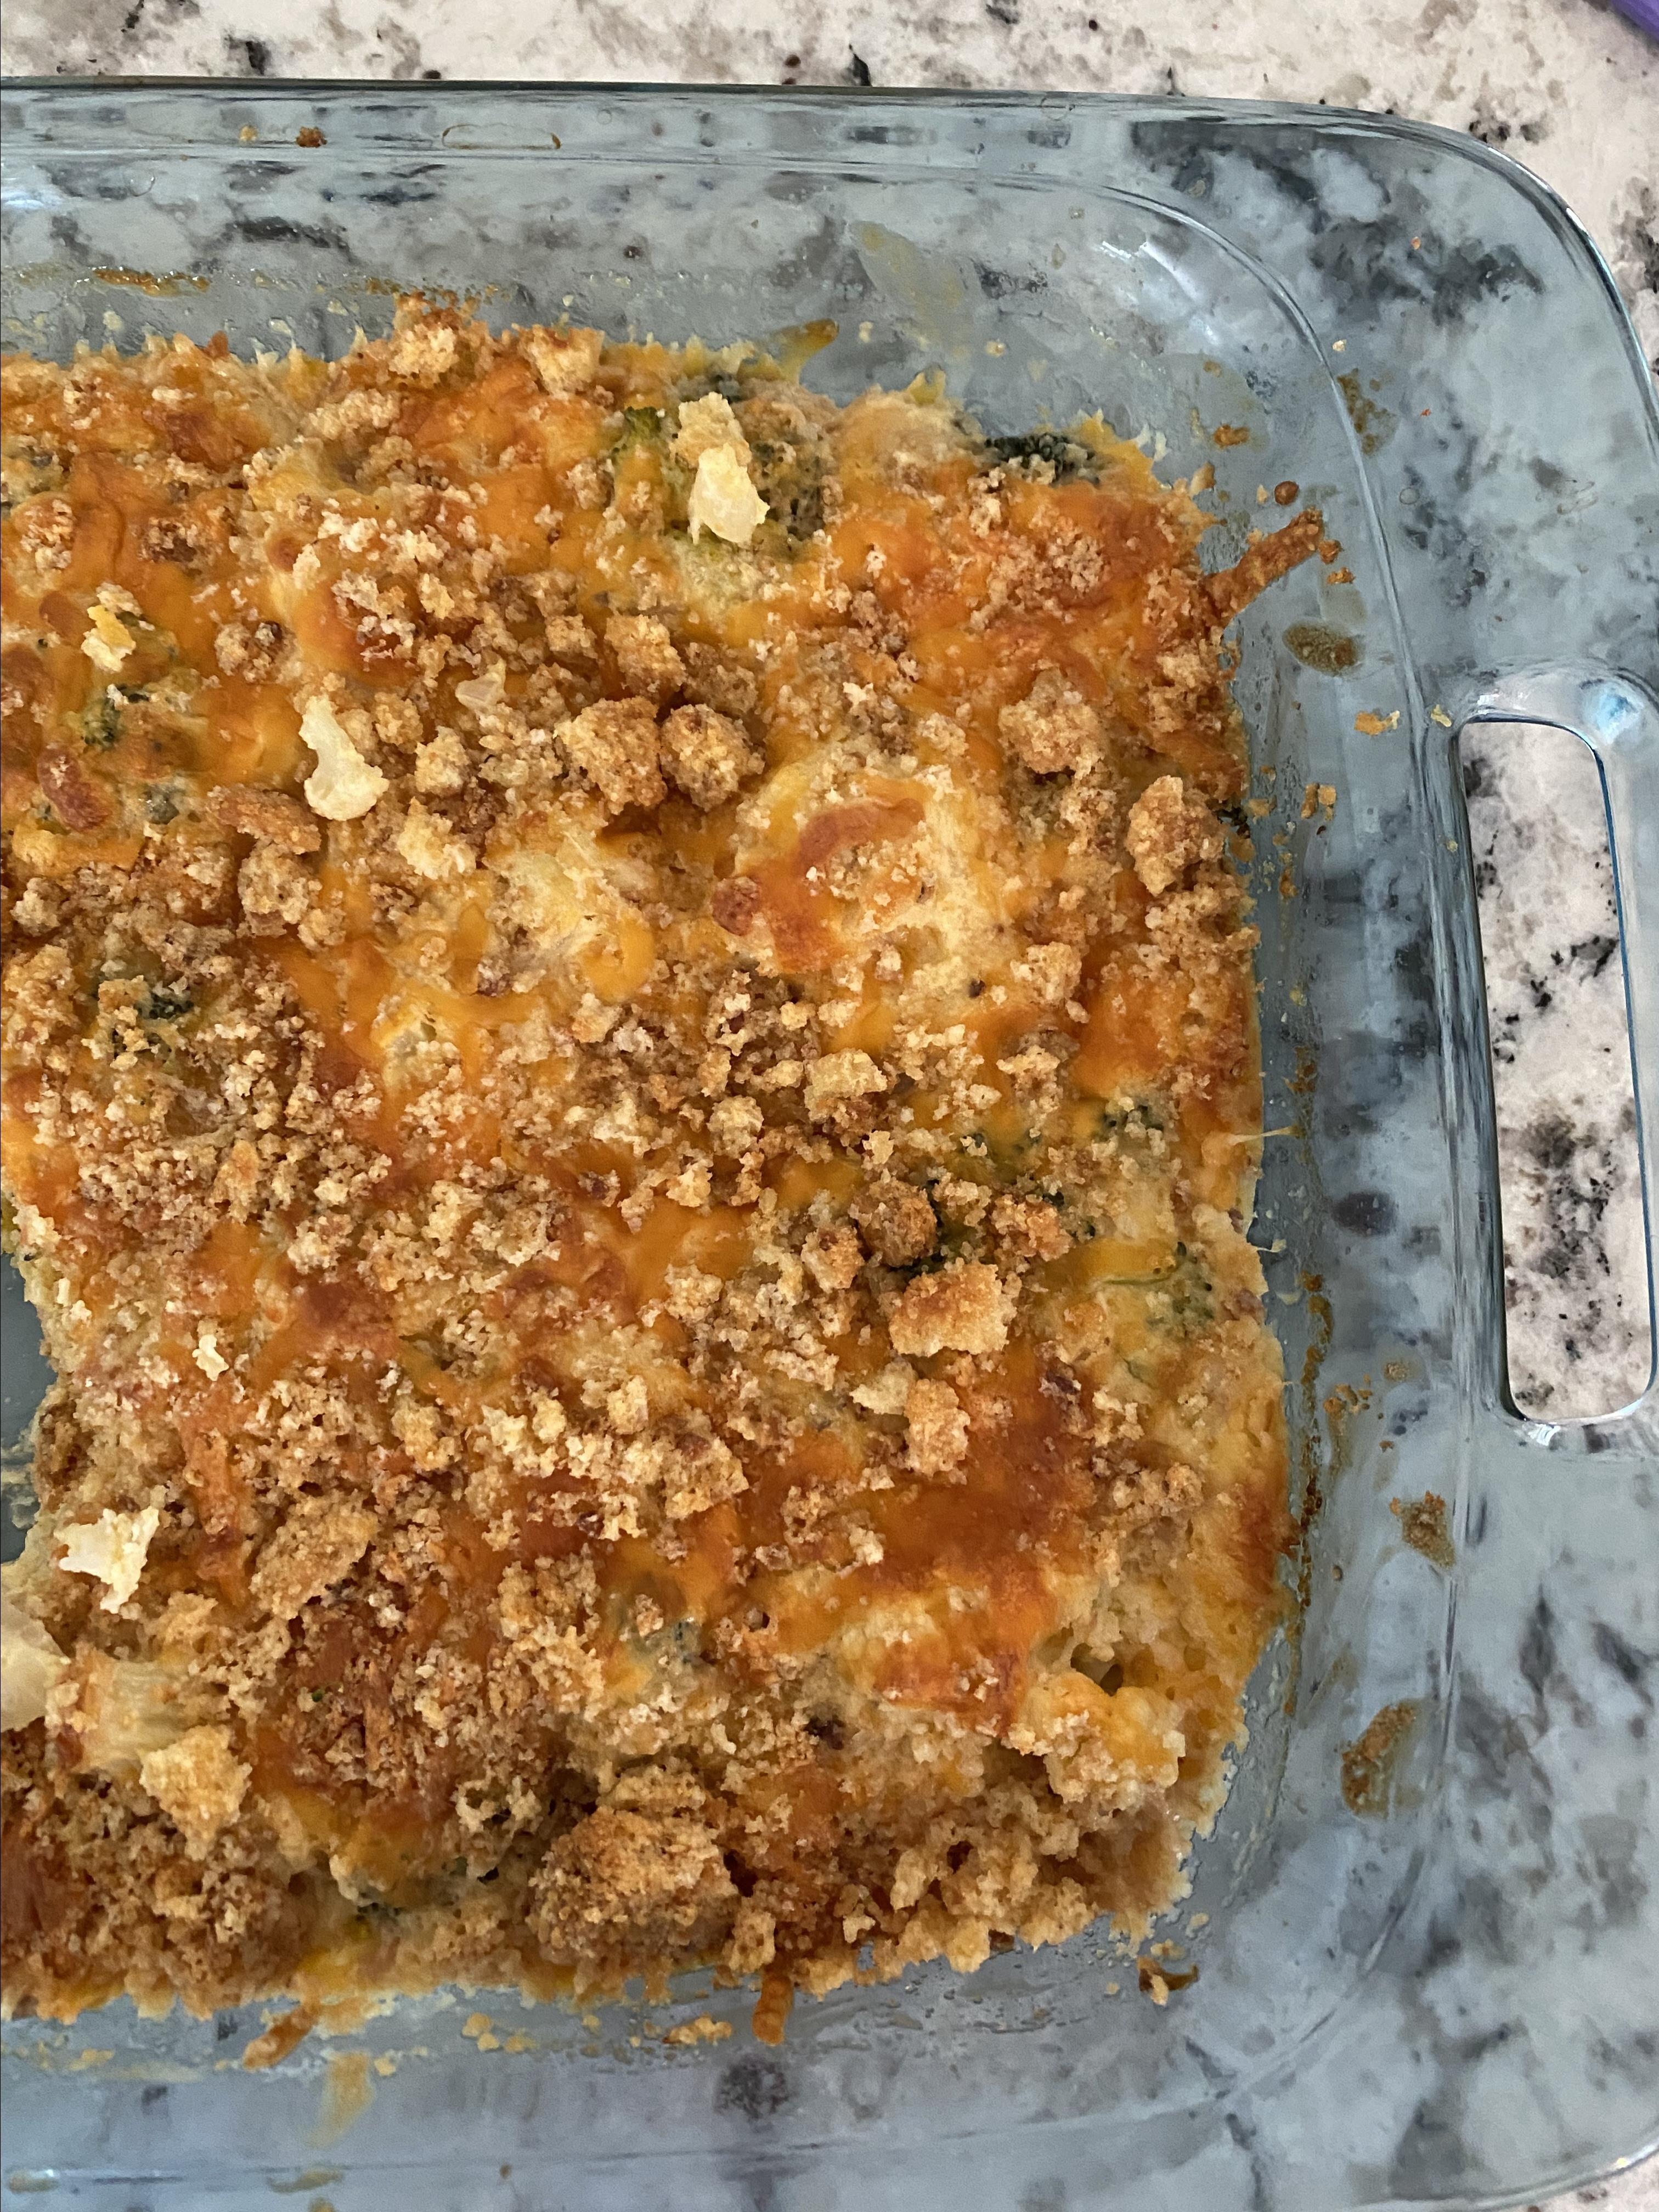 broccoli and cauliflower bake recipe